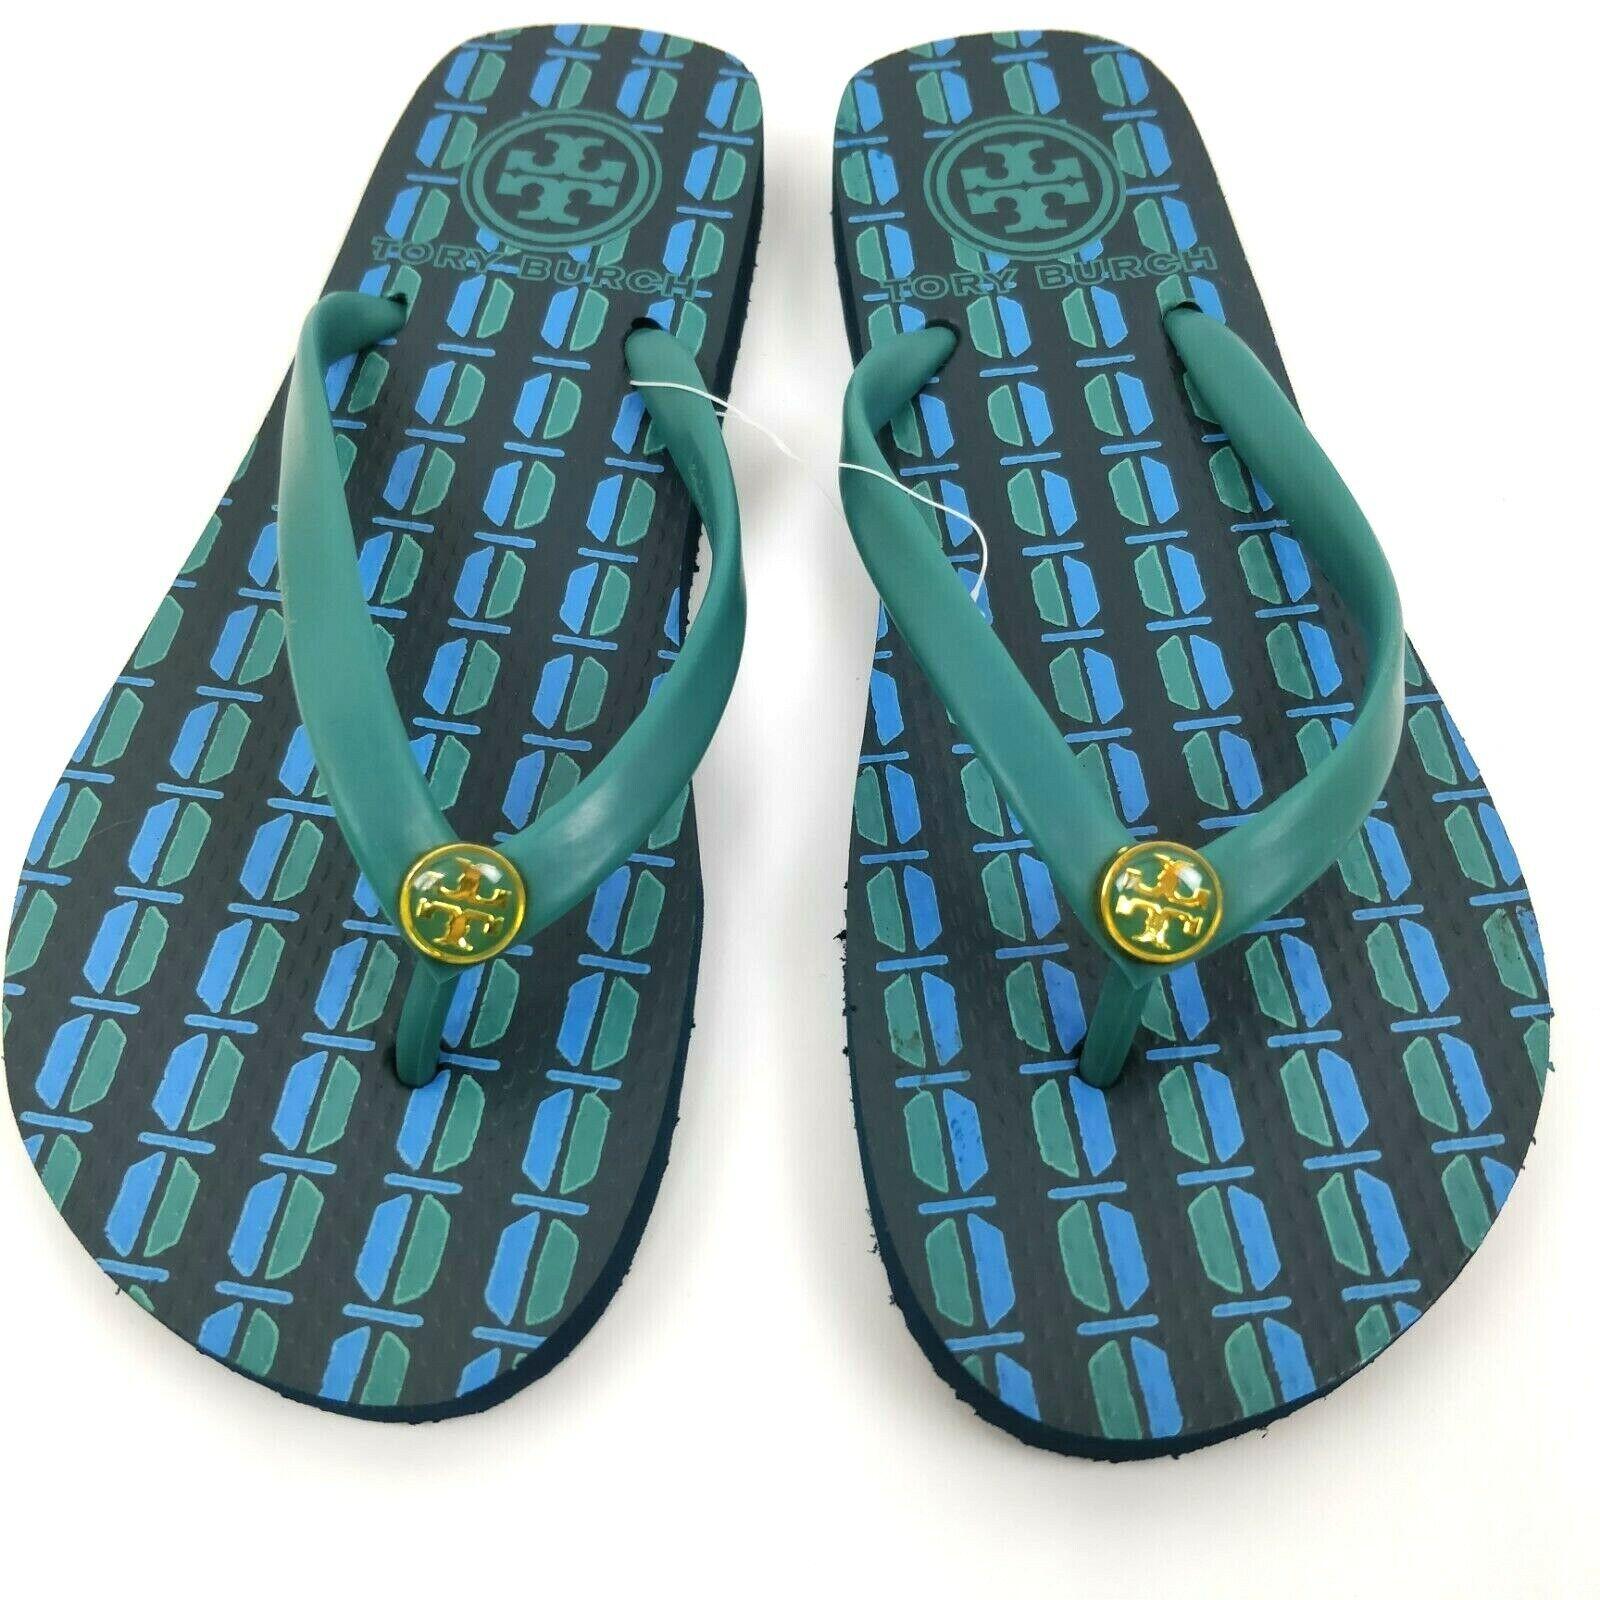 TORY BURCH Size 6 - 6.5 Basic Rubber Flip Flops Thongs Sandals gold Logo New